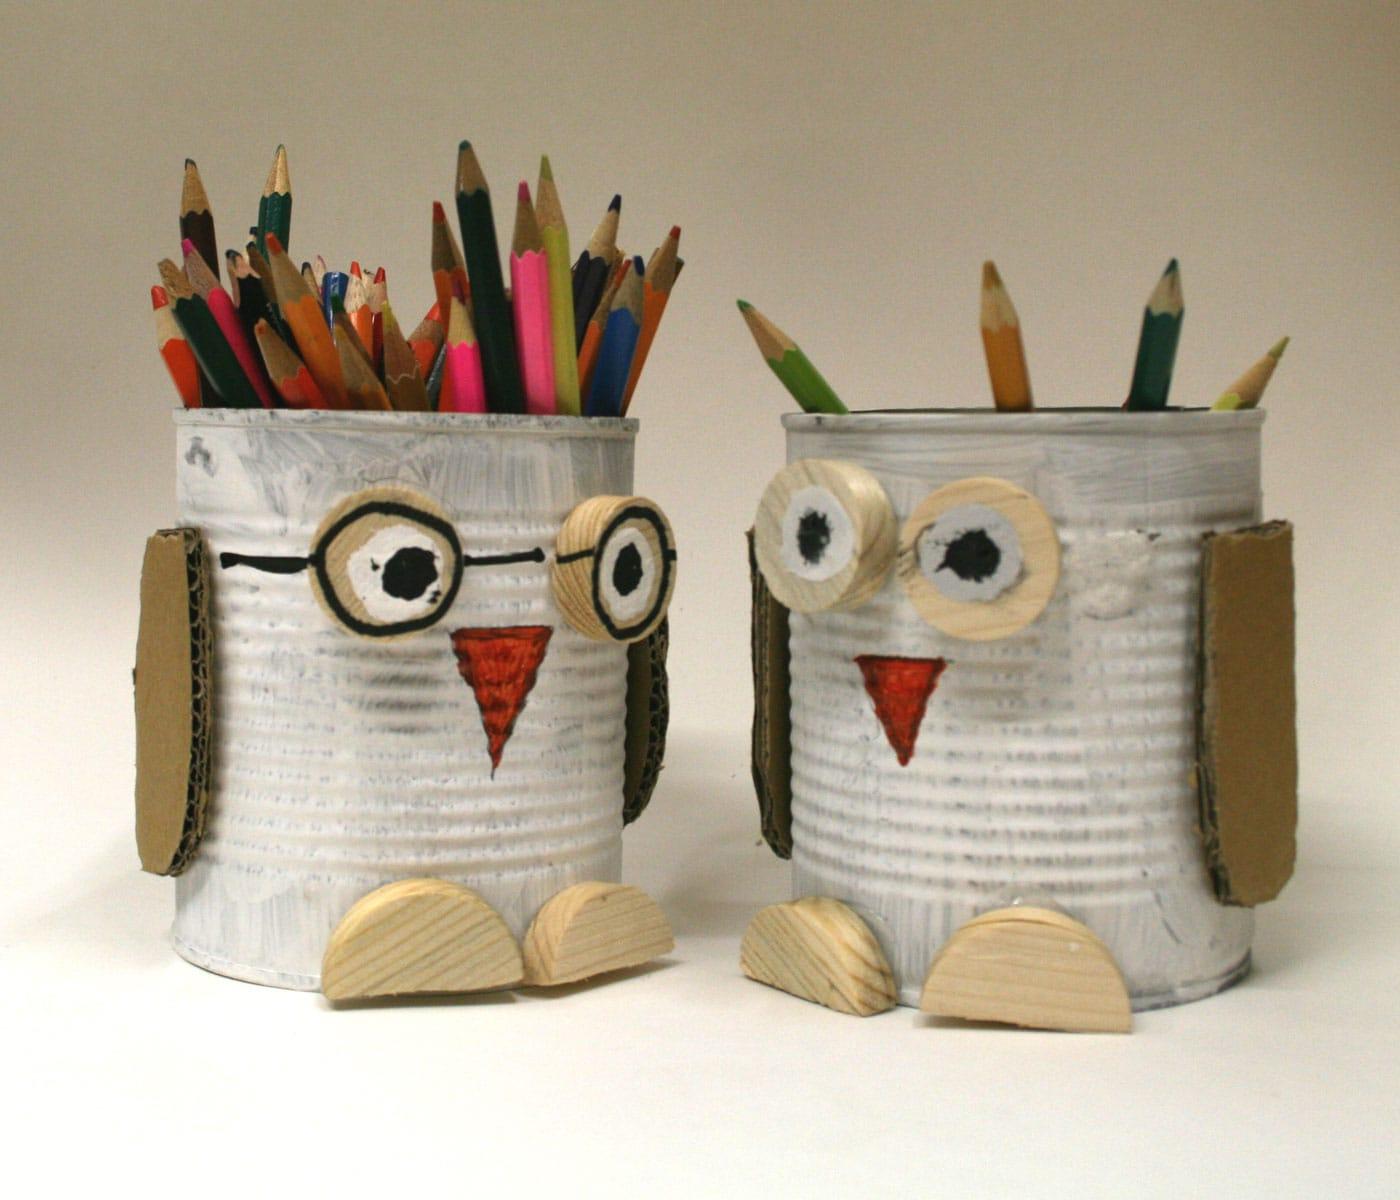 Kurse für Kinder und Jugendliche in der Jugendkunstschule Pankw: Upcycling // HIMBEER